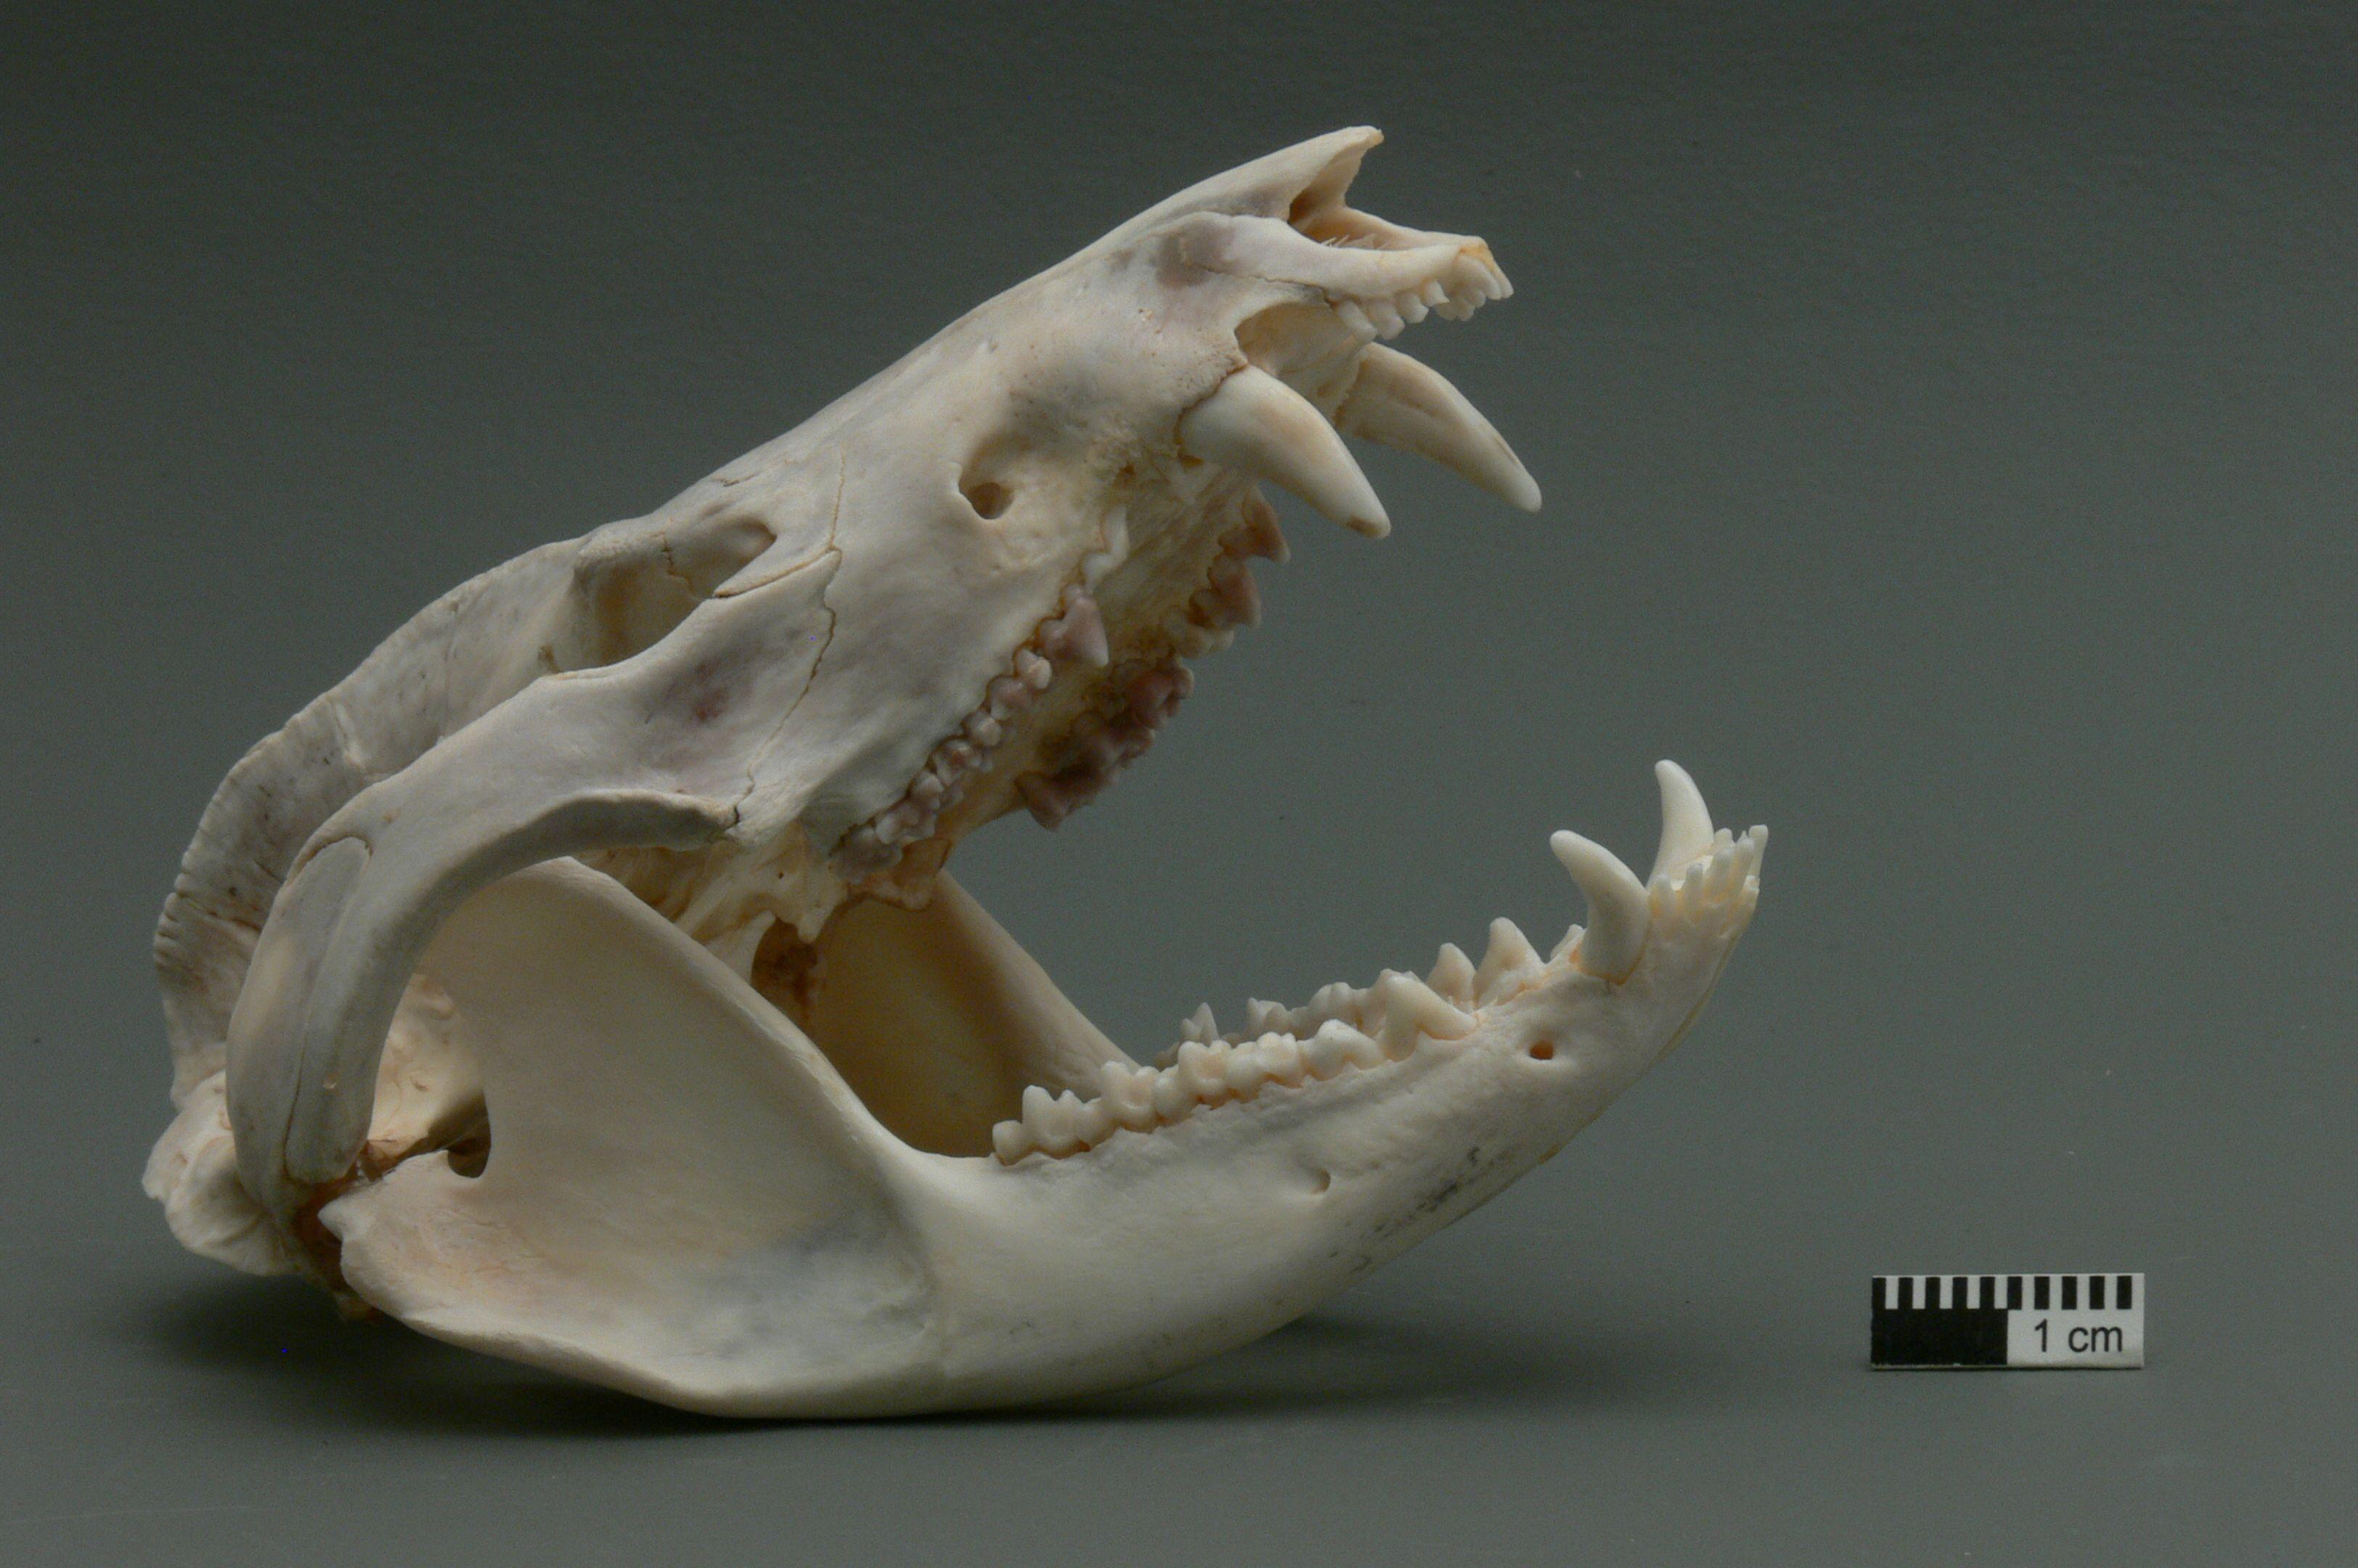 Skulls and Teeth | Stranger Things in 2019 | Possum skull ...